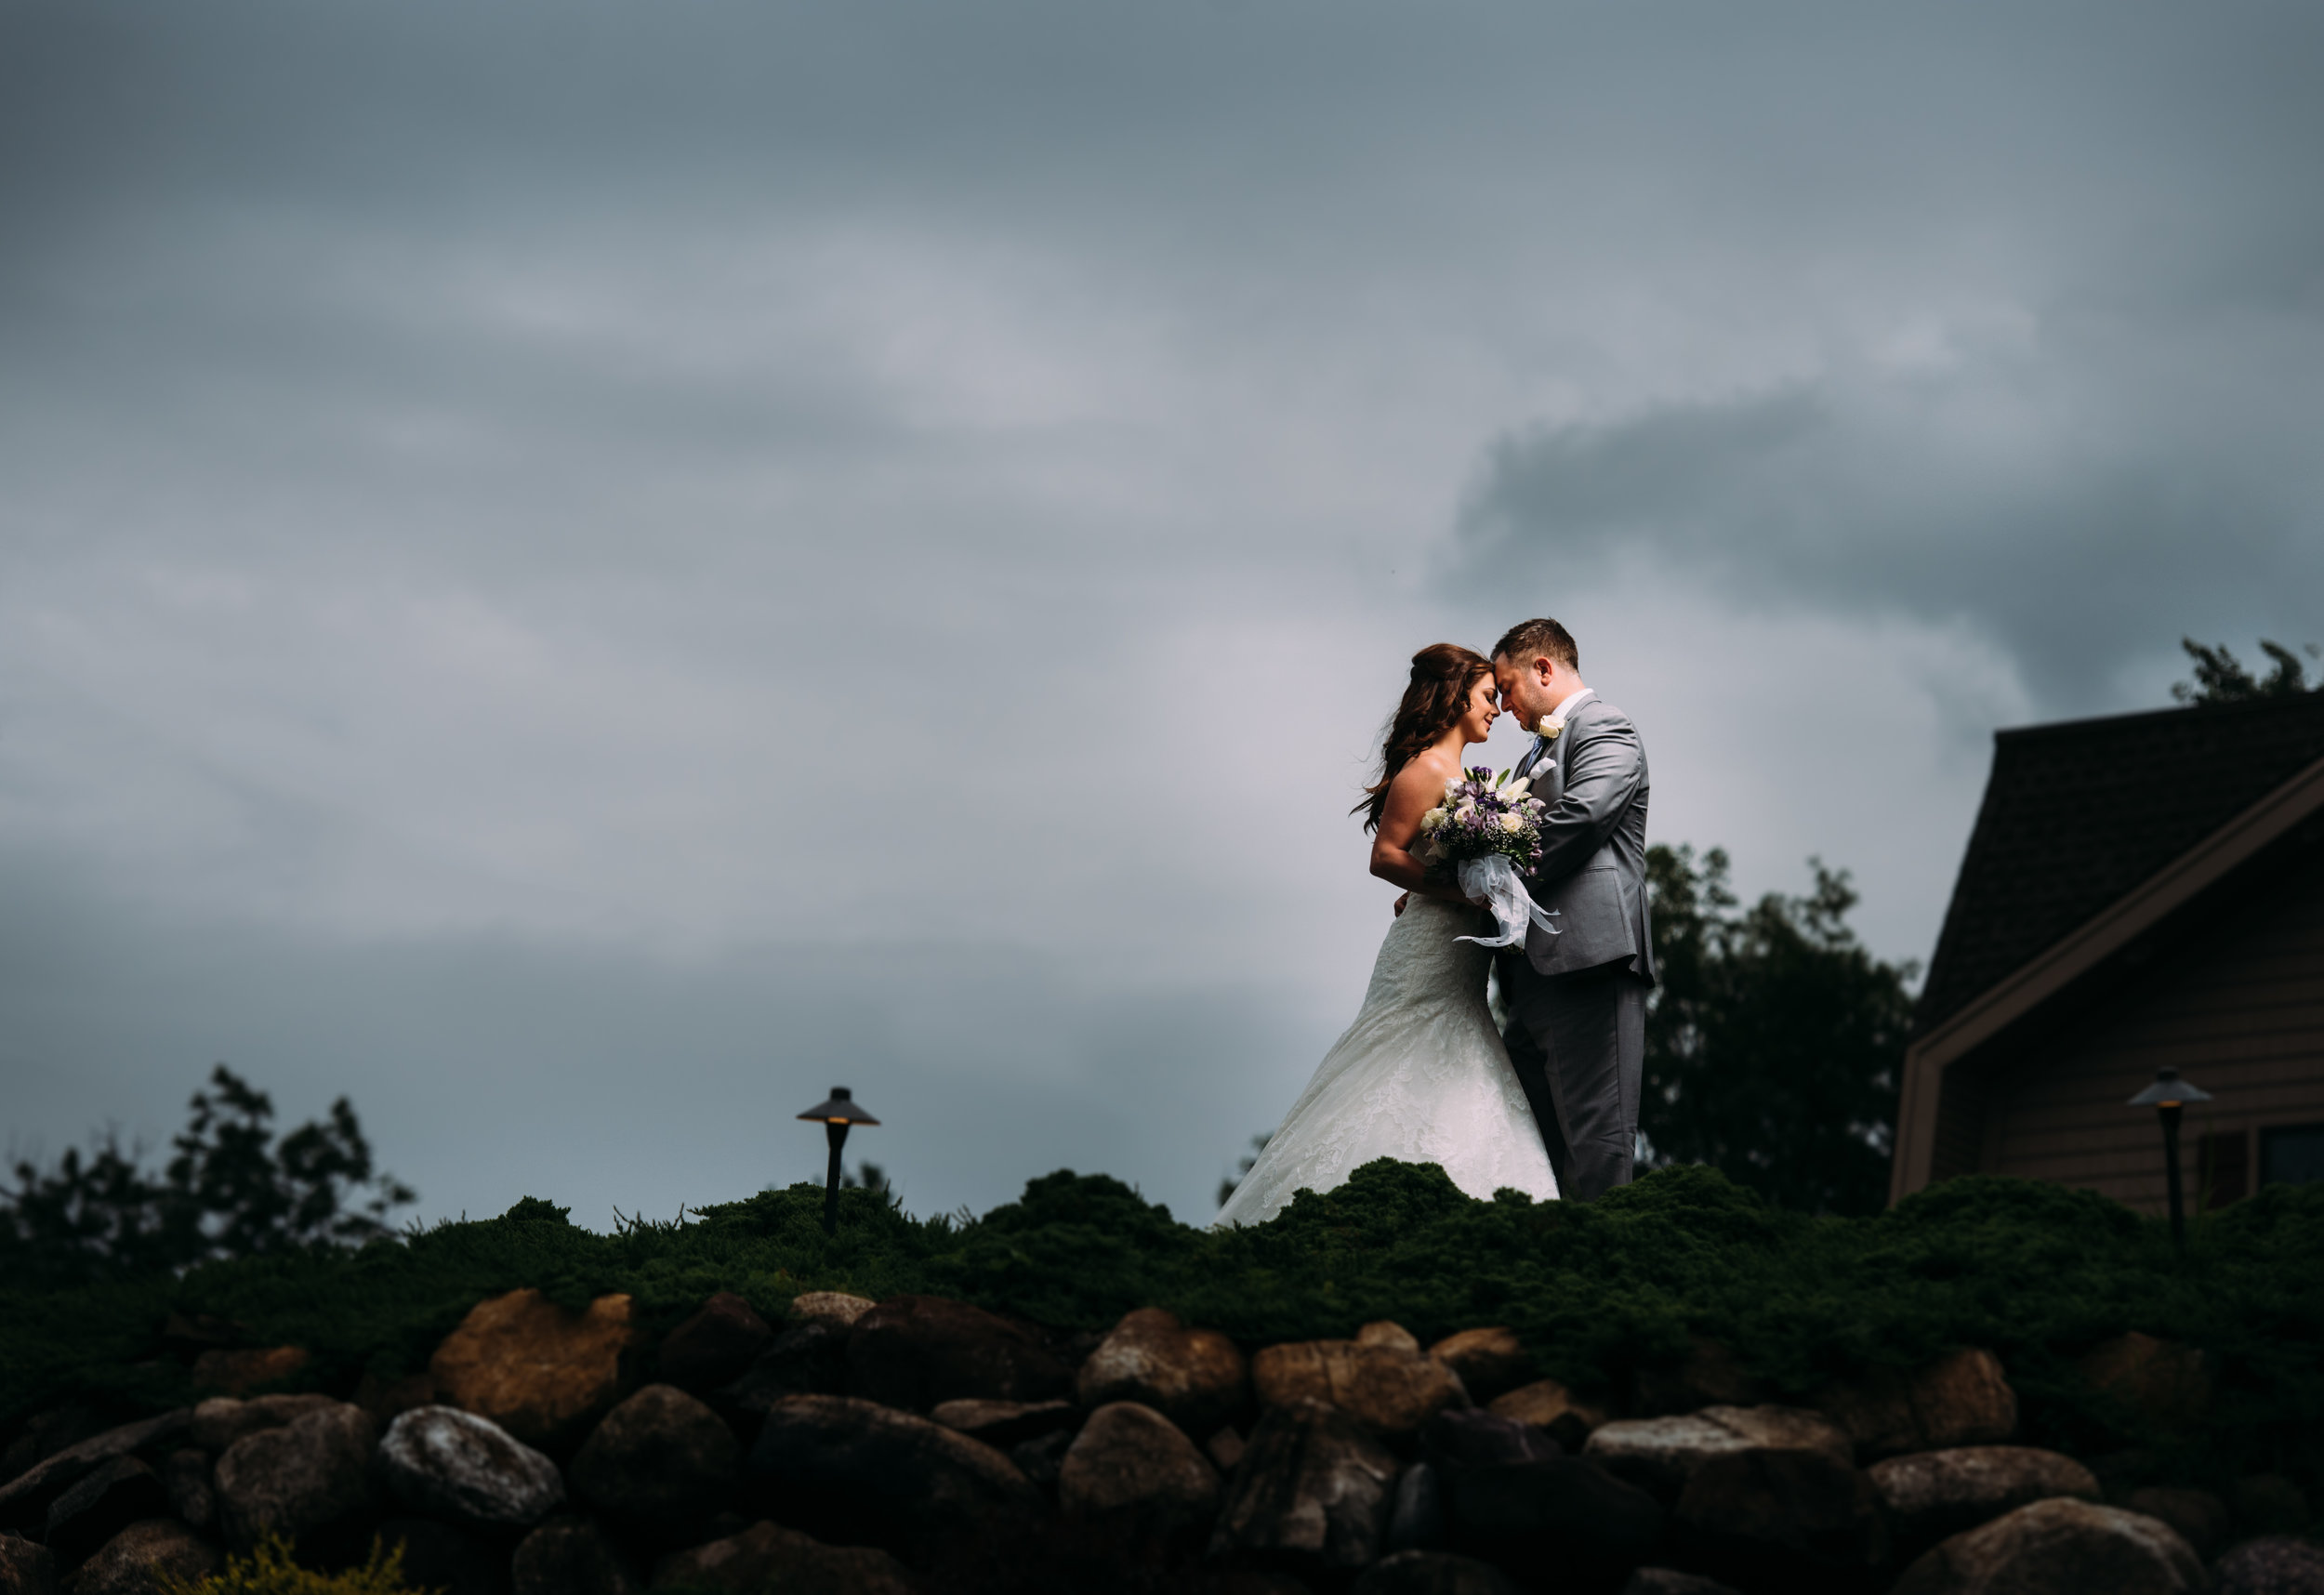 WeddingPhotos | NJPhotographer | Highlights-4-20.jpg